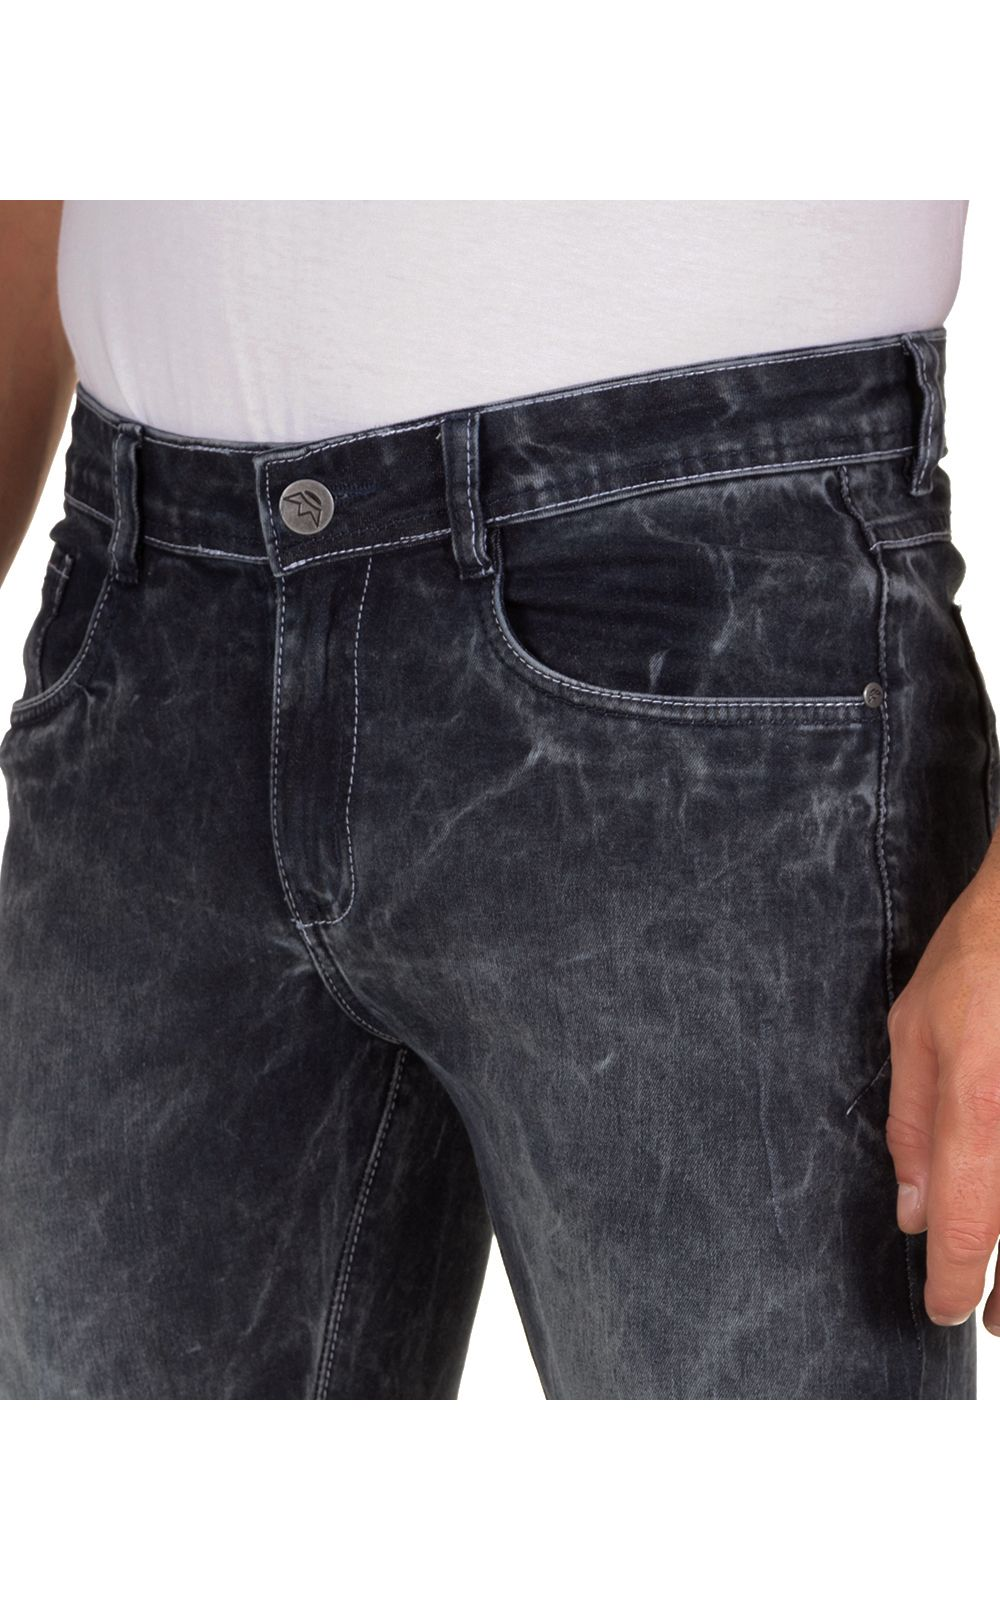 Foto 3 - Calça Jeans Masculina Preta Texturizada